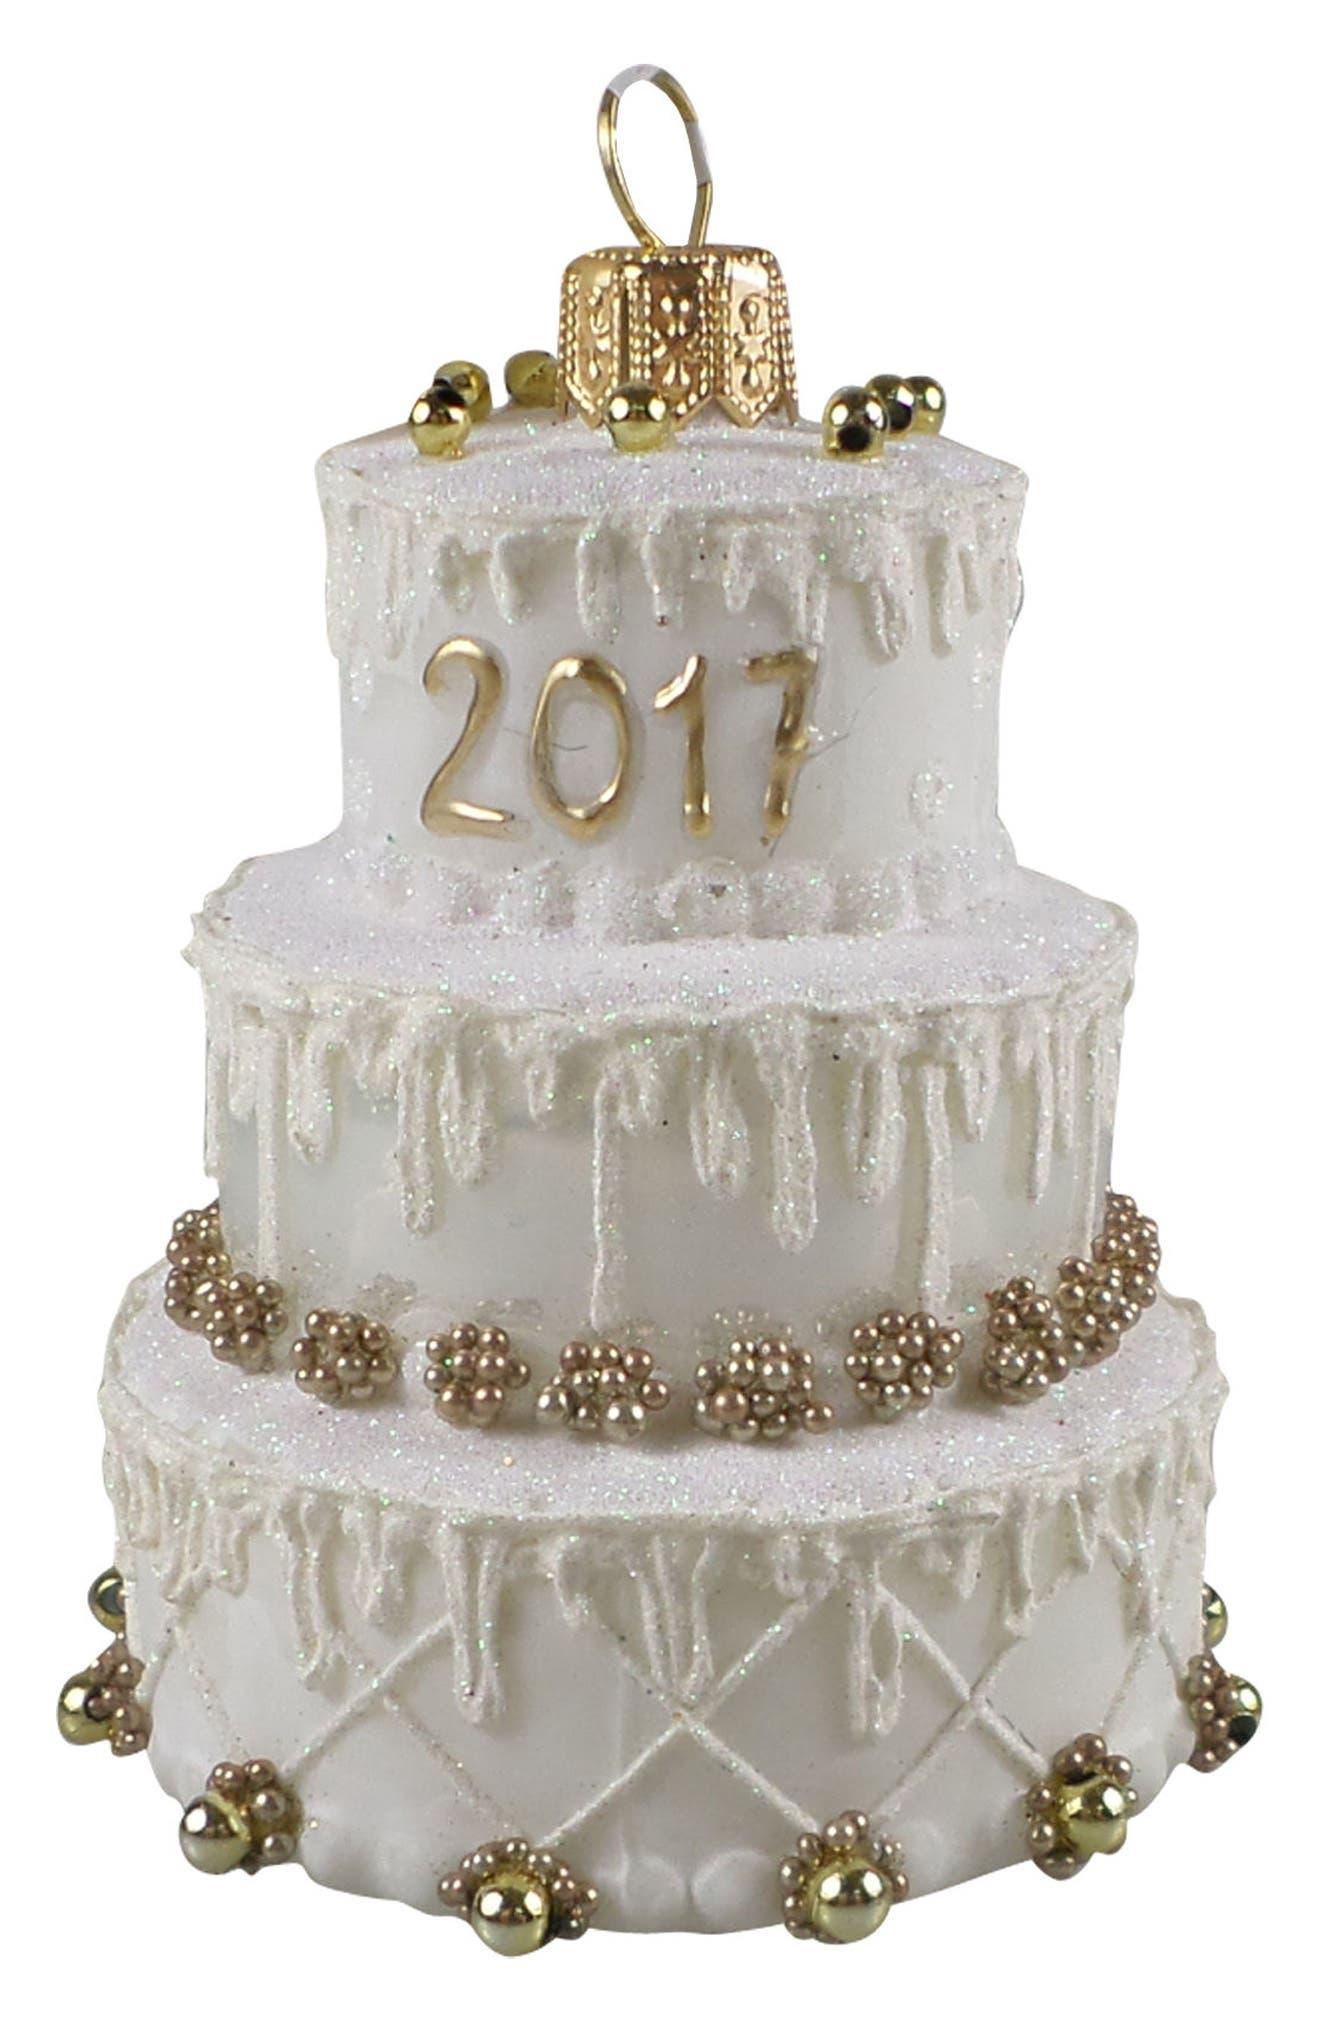 Handblown Glass Wedding Cake Ornament,                             Main thumbnail 1, color,                             100